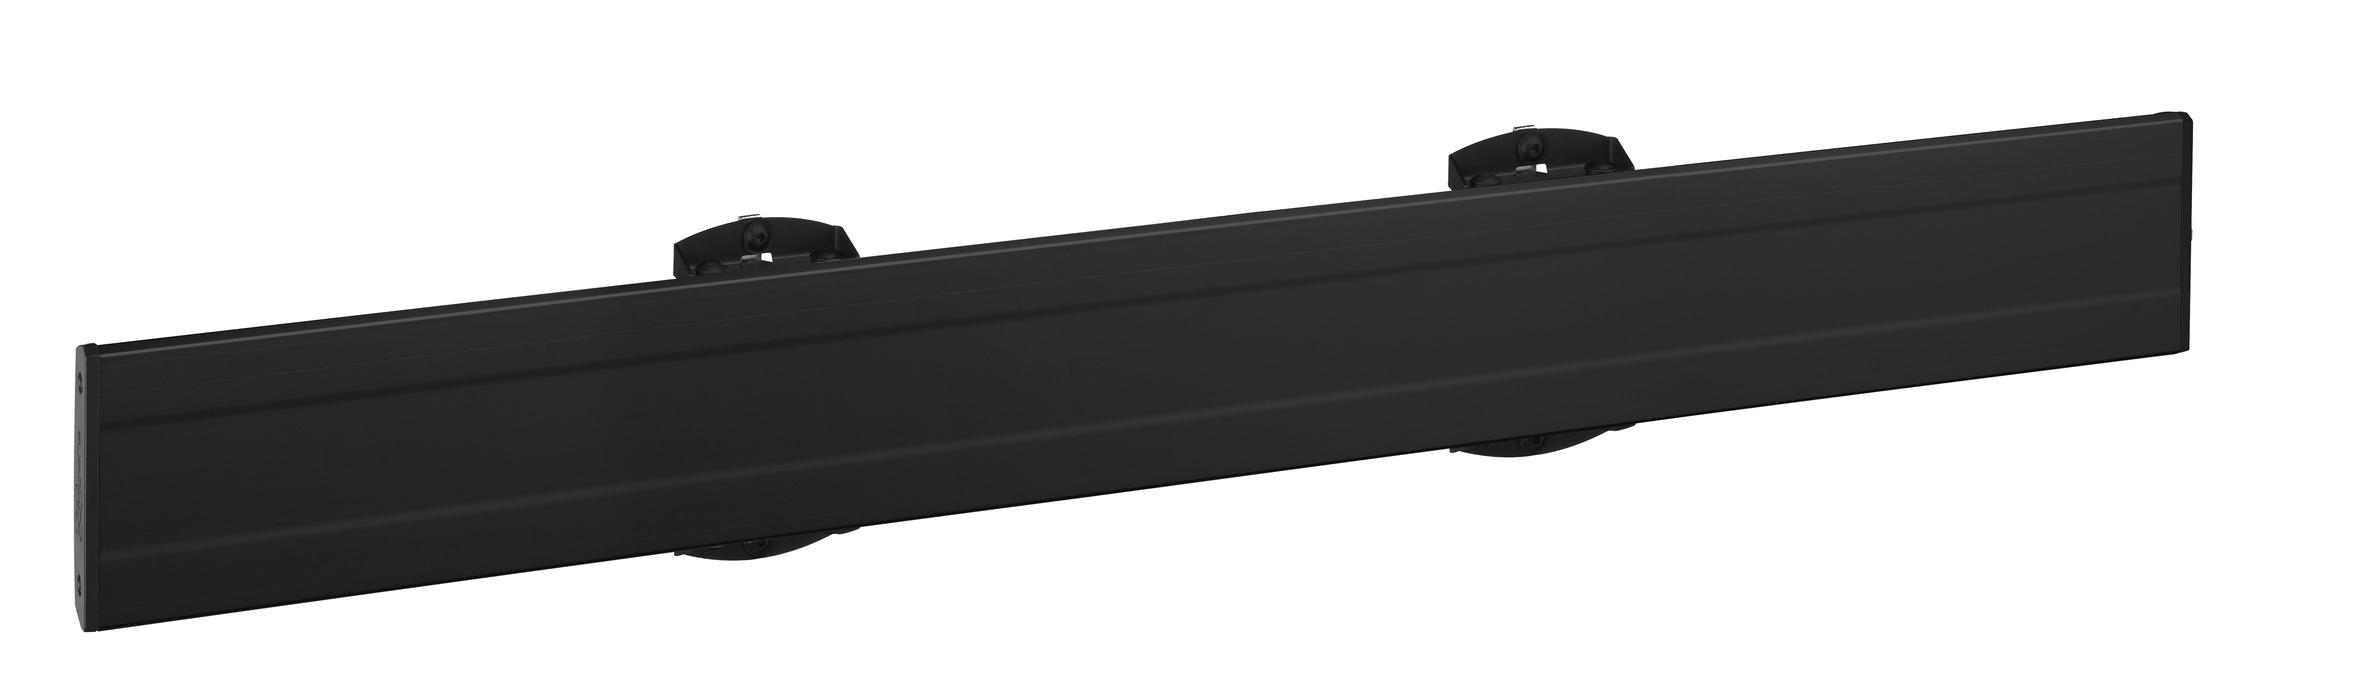 Vogel's PFB 3411 Interface bar 1175 mm black